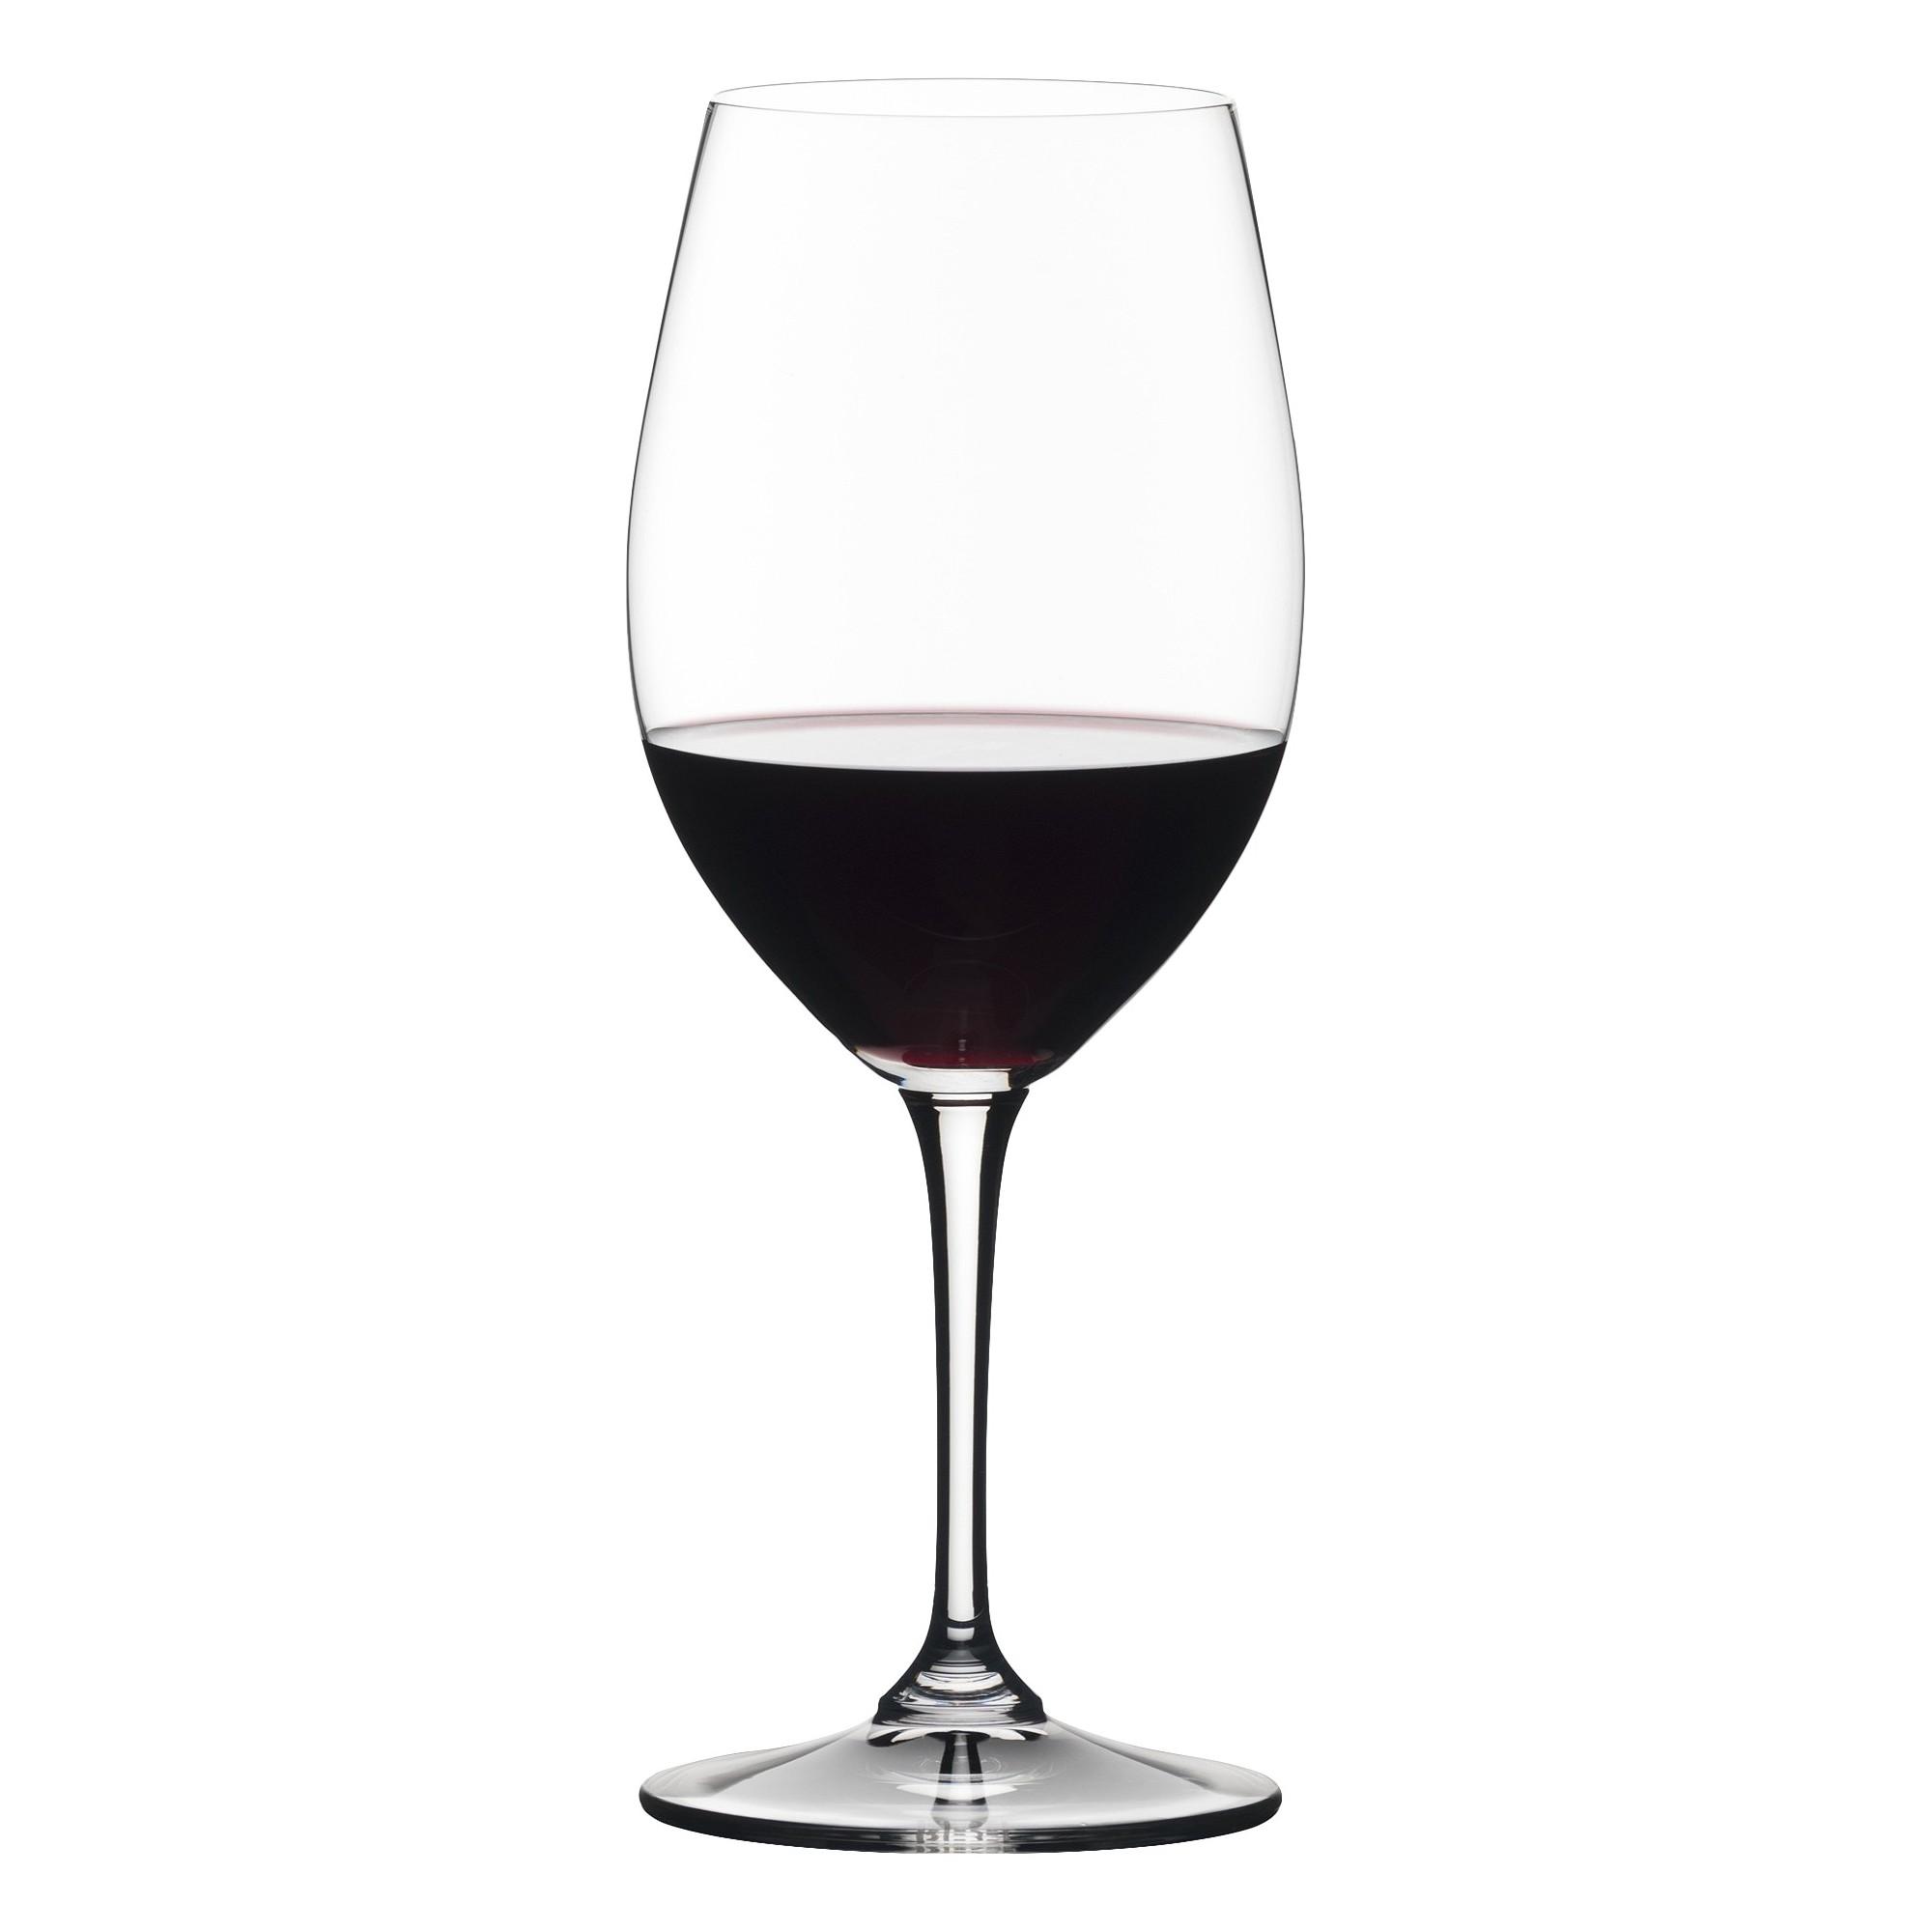 Riedel Vivant 4pk Red Wine Glass Set 19.753oz, Clear